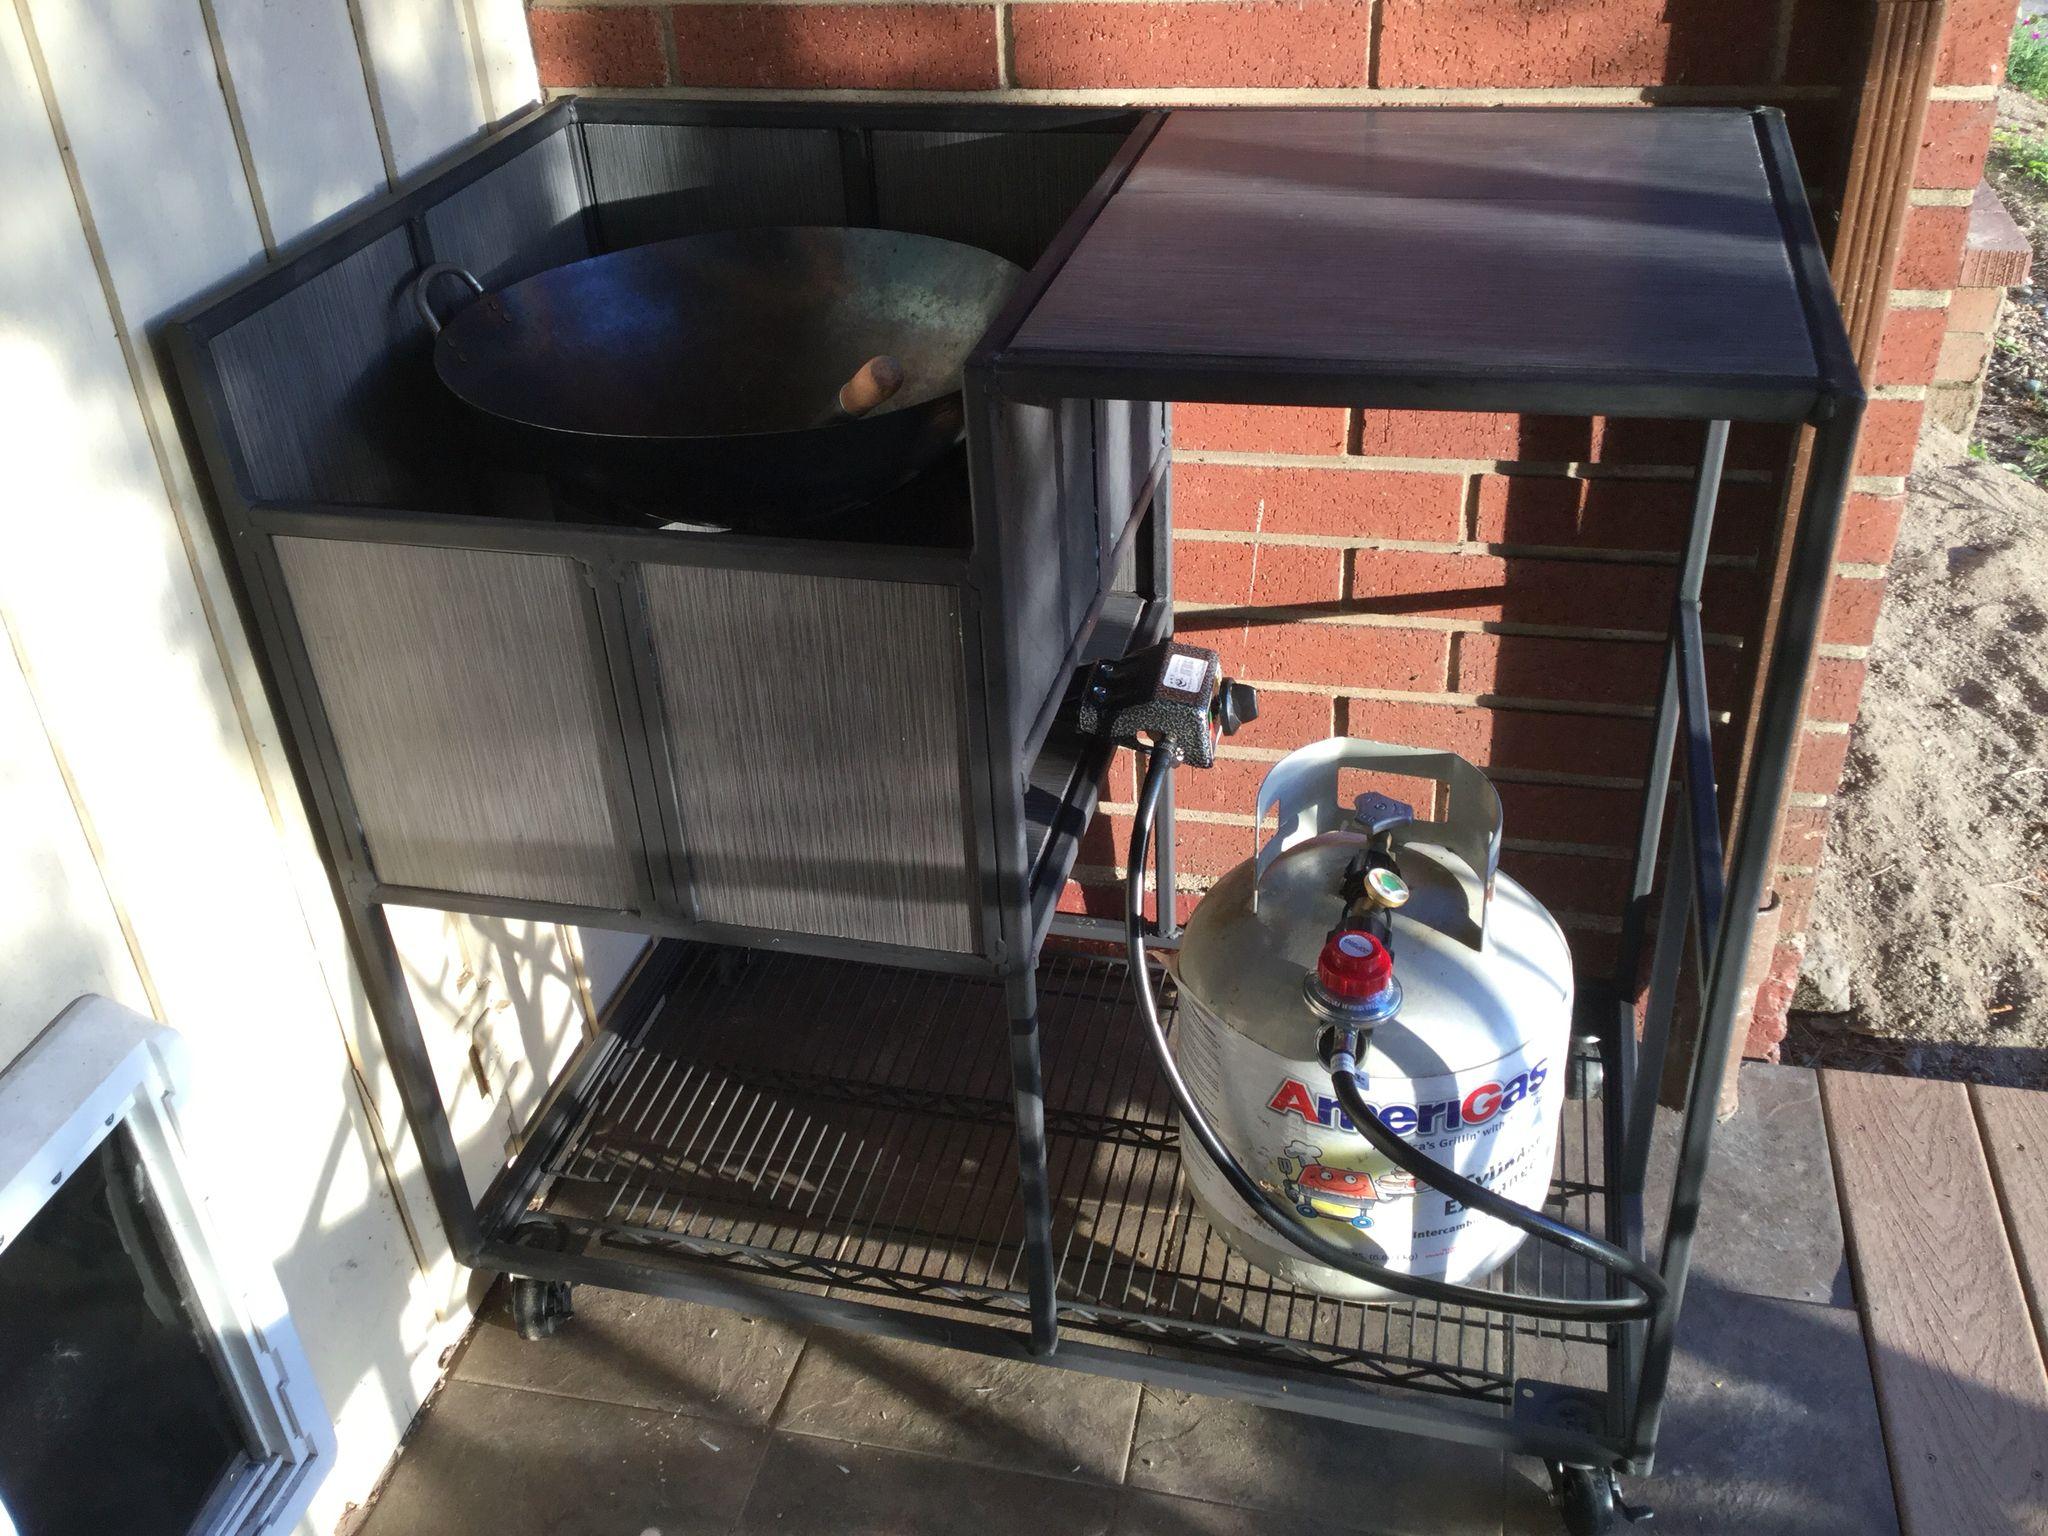 Outdoor Wok Burner Stand Built In Outdoor Grill Cooktop Outdoor Diy Projects